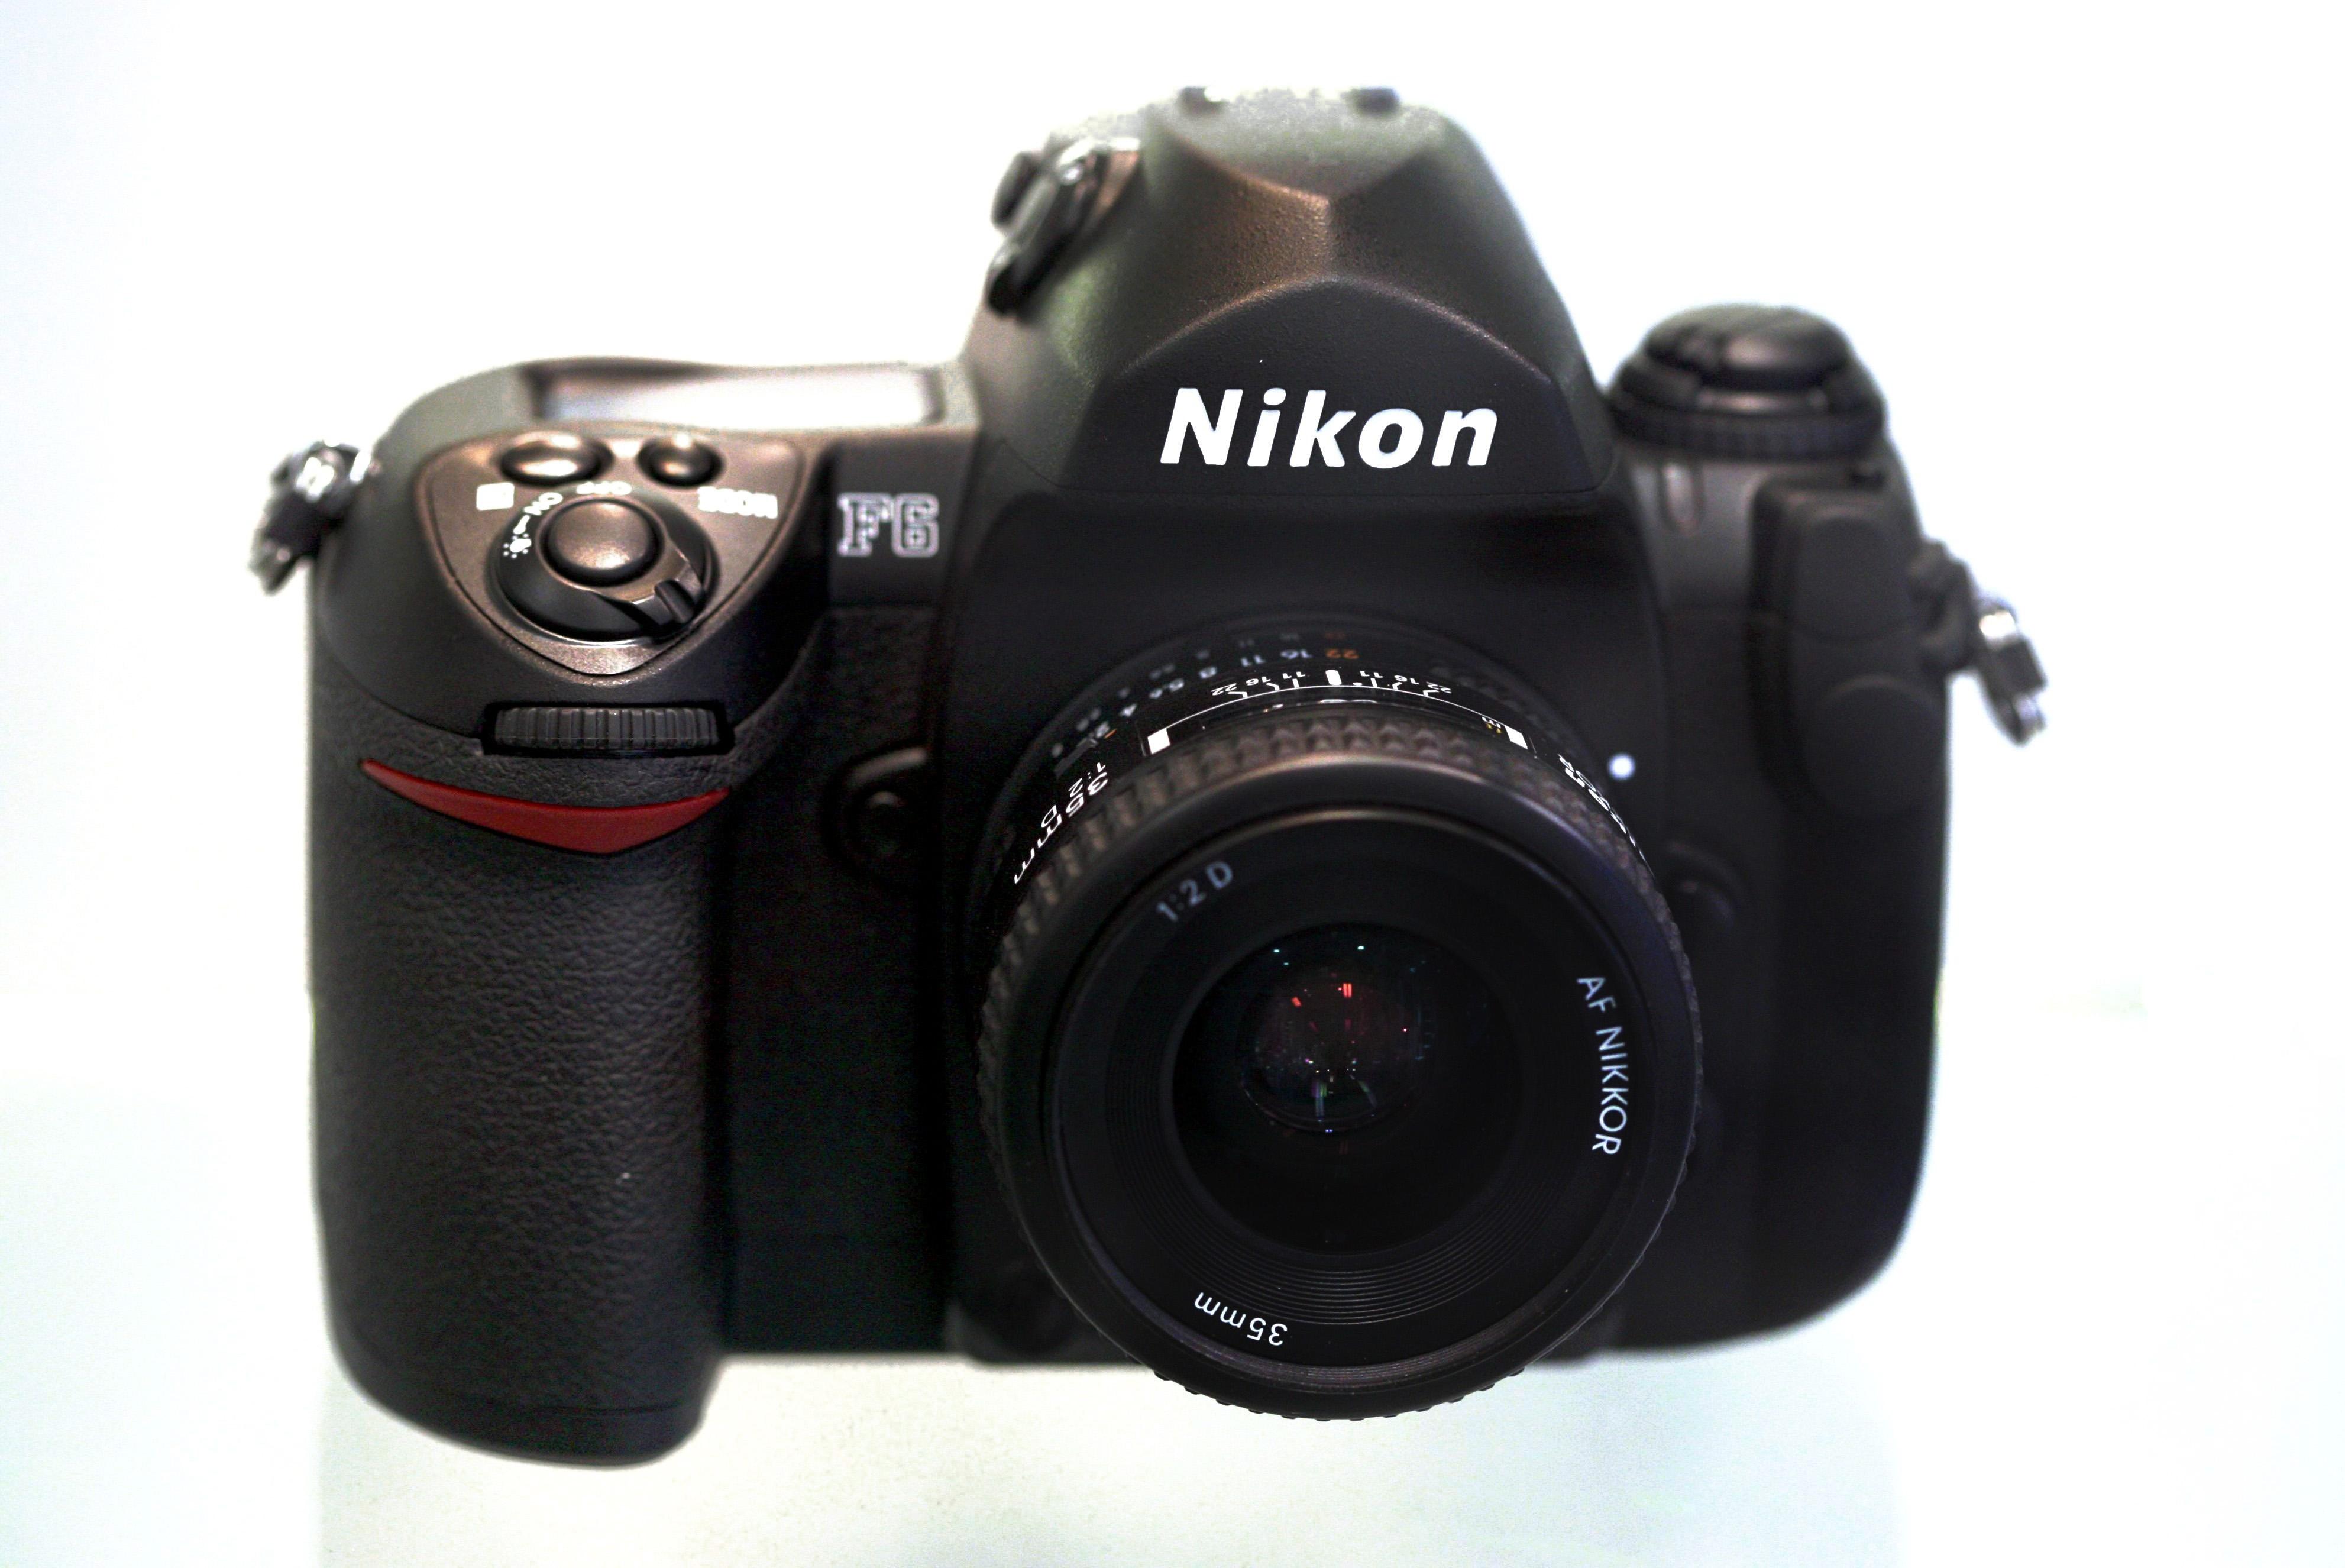 Nikon F6 (Pic: Thegreenj/Wikimedia Commons)